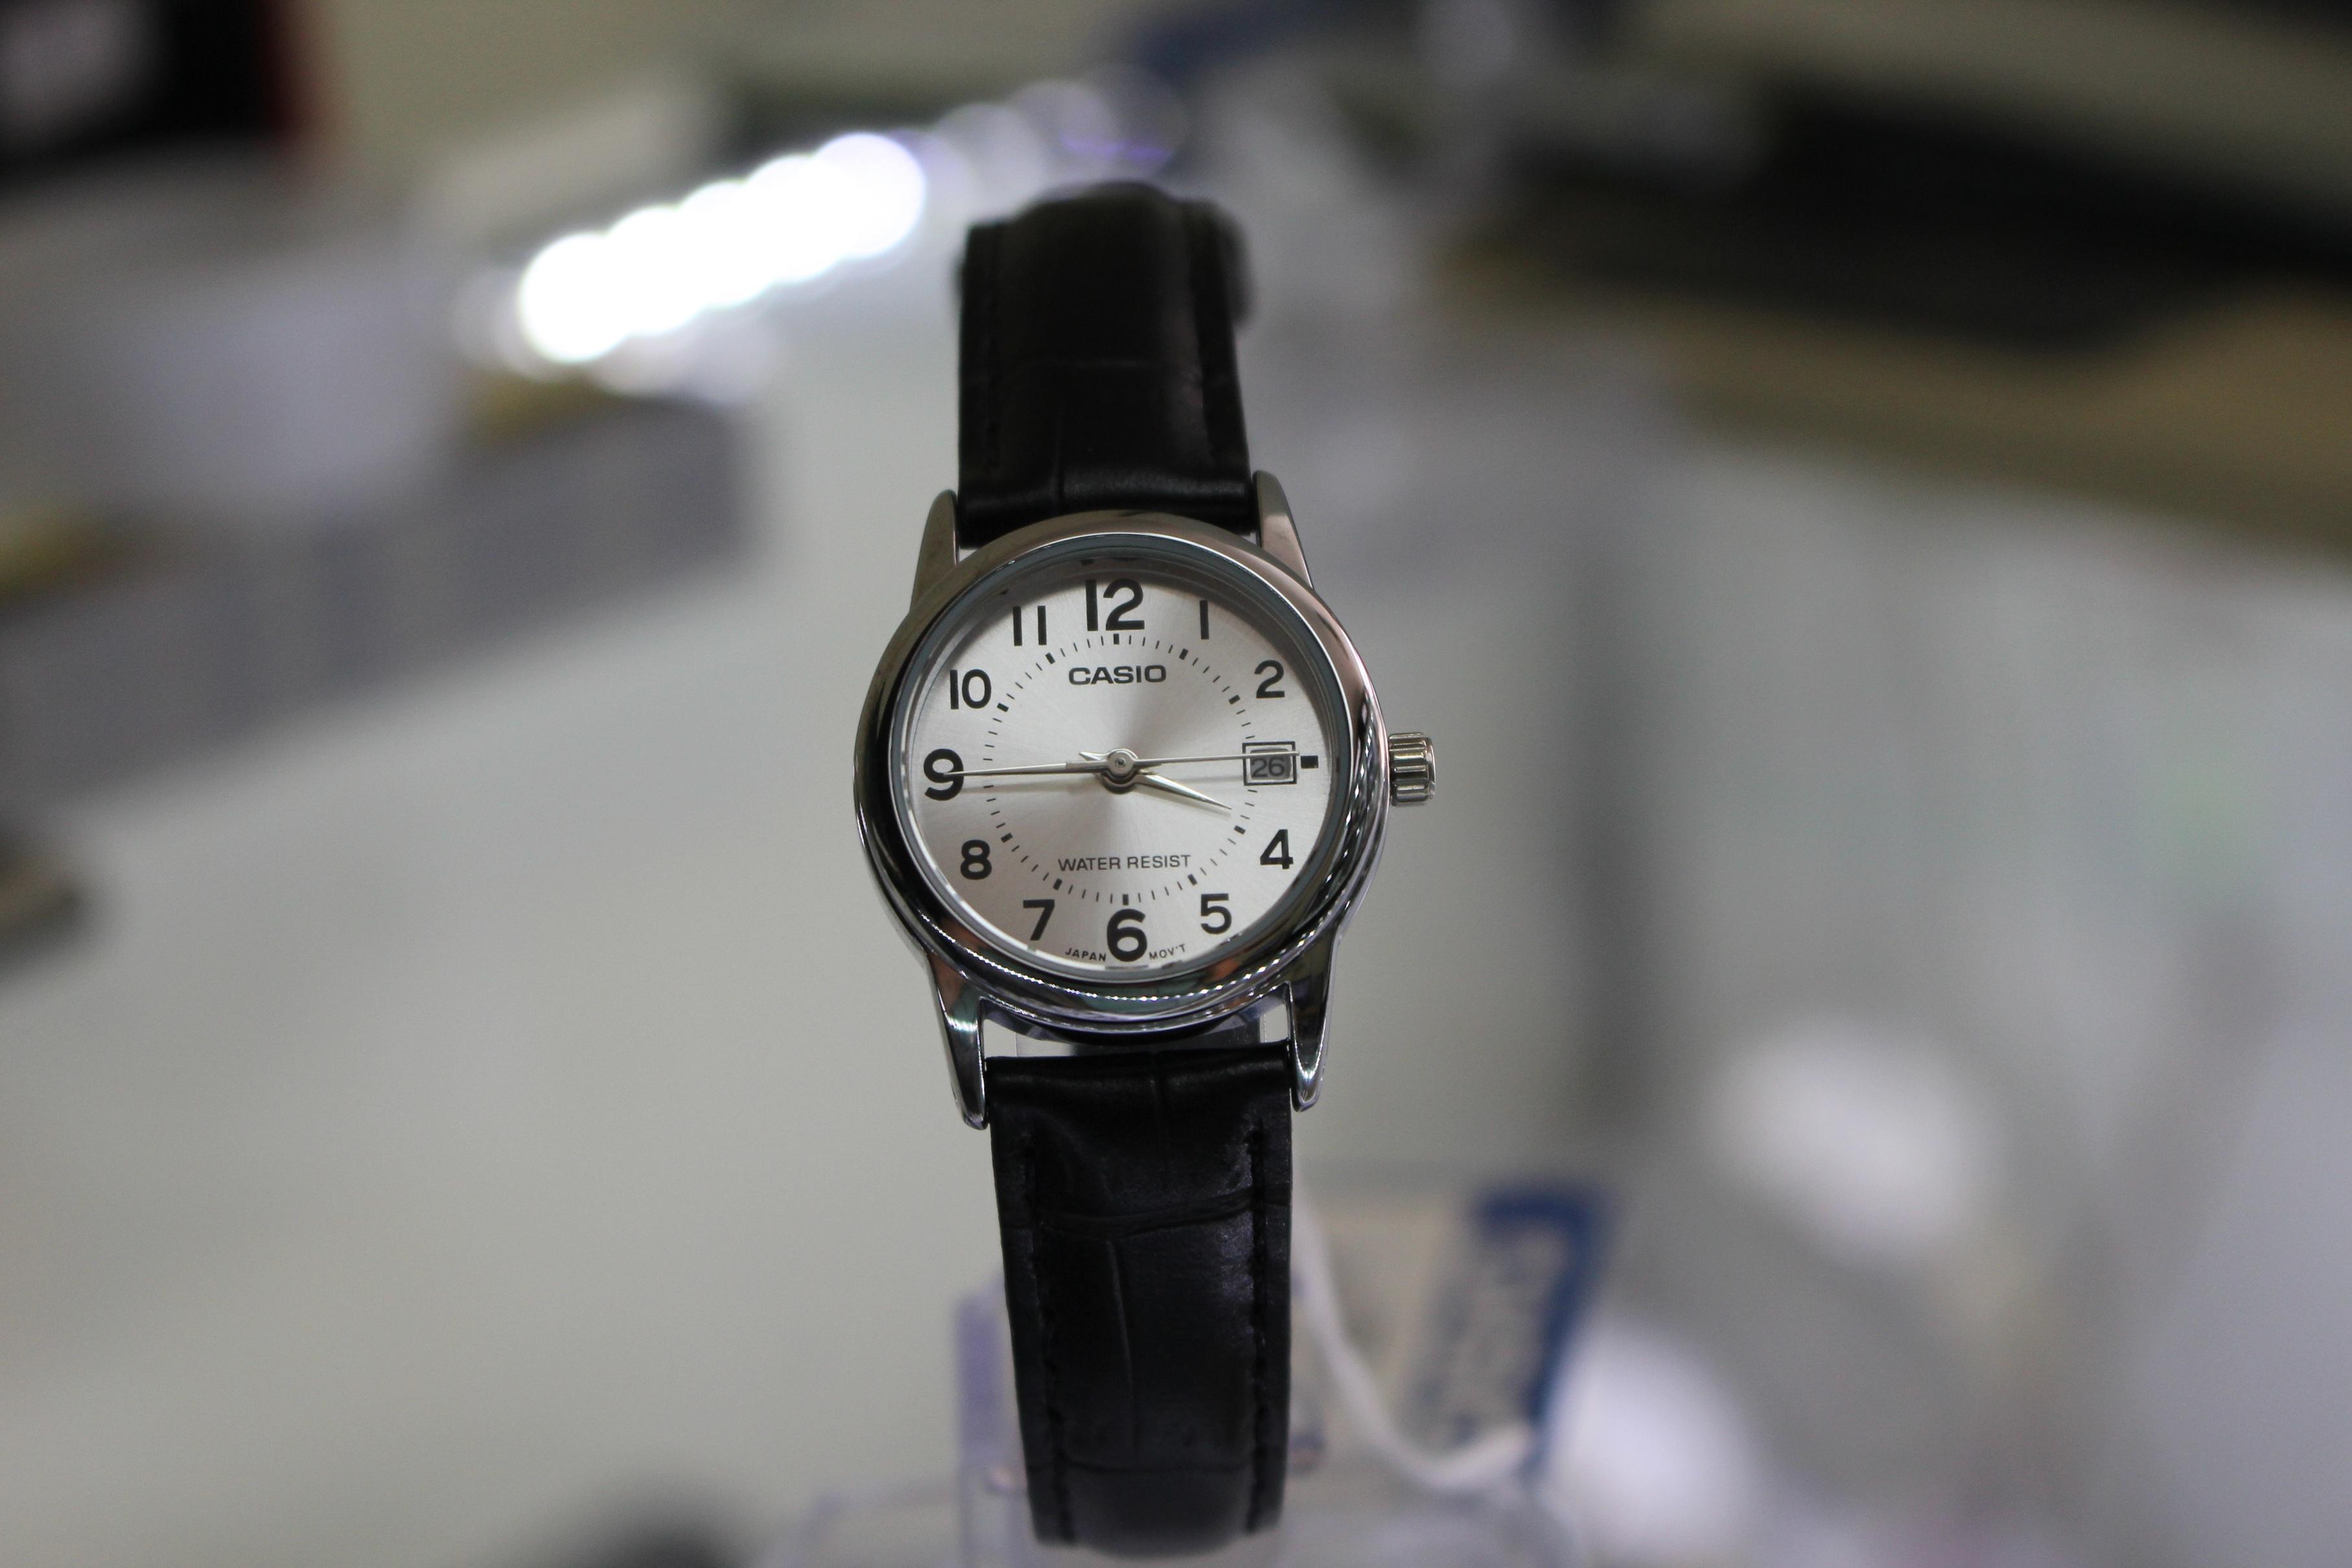 Đồng hồ Casio LTP-V002L-7BUDF